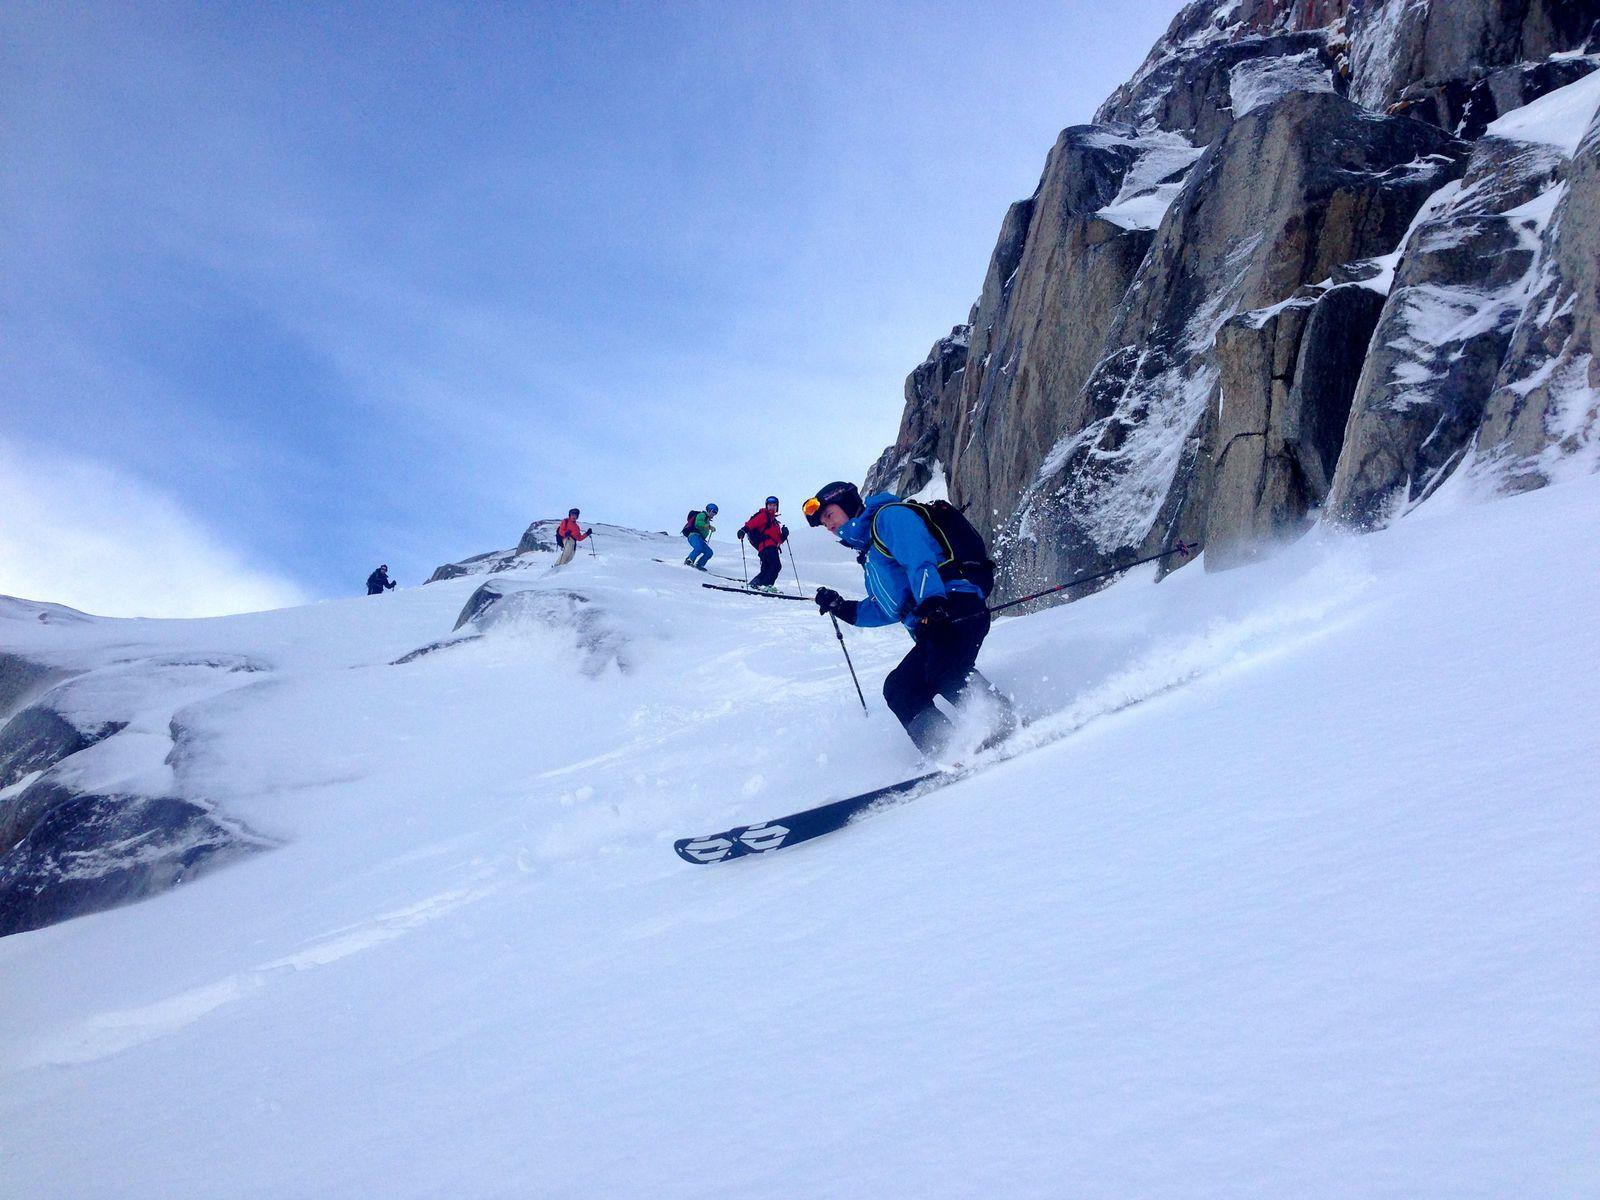 Free ride/hors pistes Chamonix Mont Blanc http://www.geromegualaguidechamonix.com